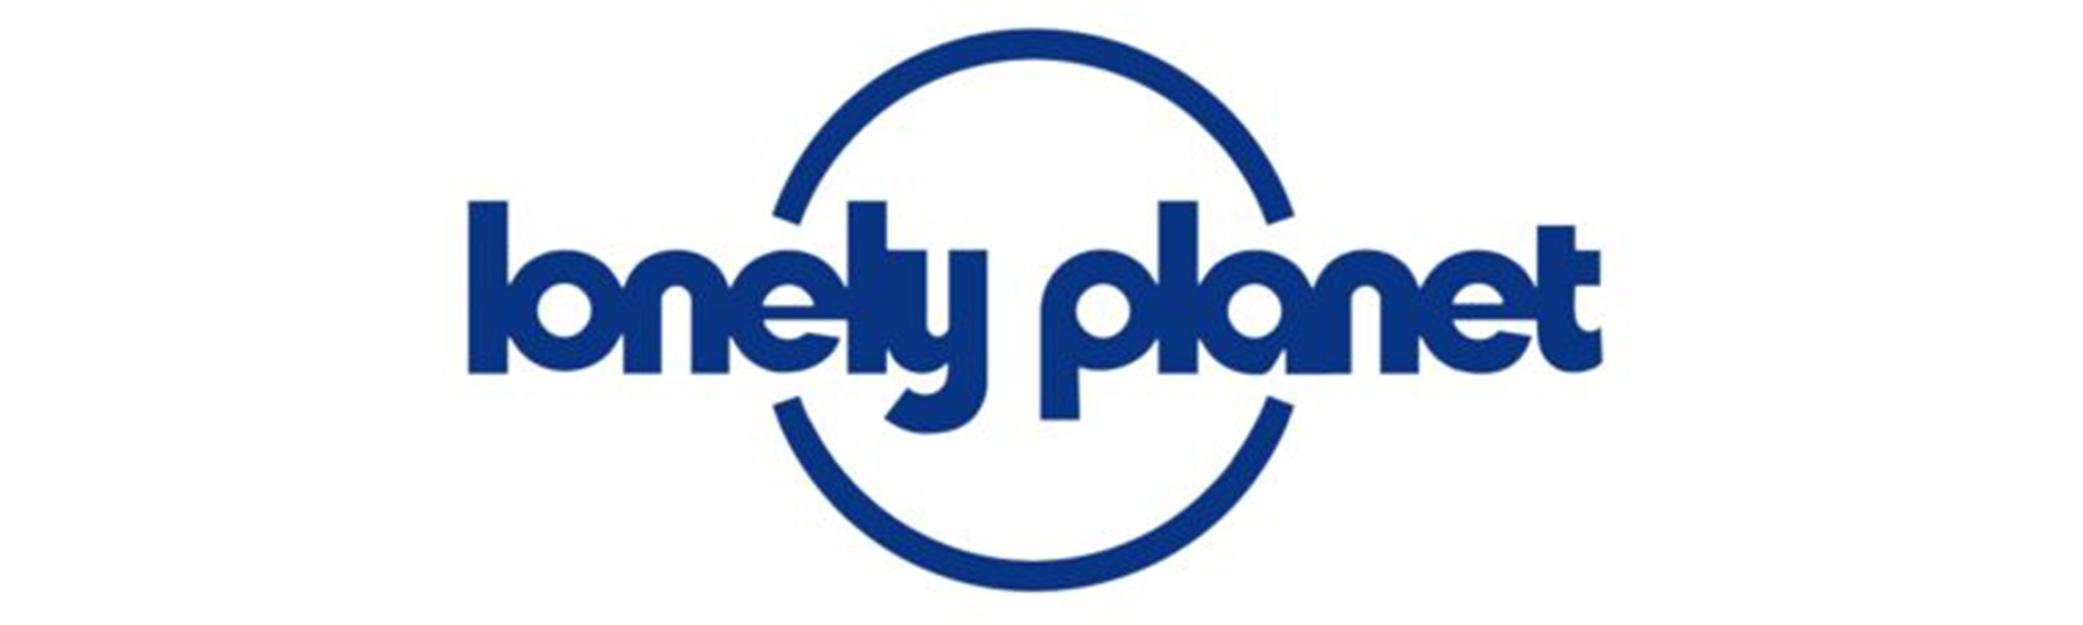 lonelyplanet_logo2-e1517925423223.jpg